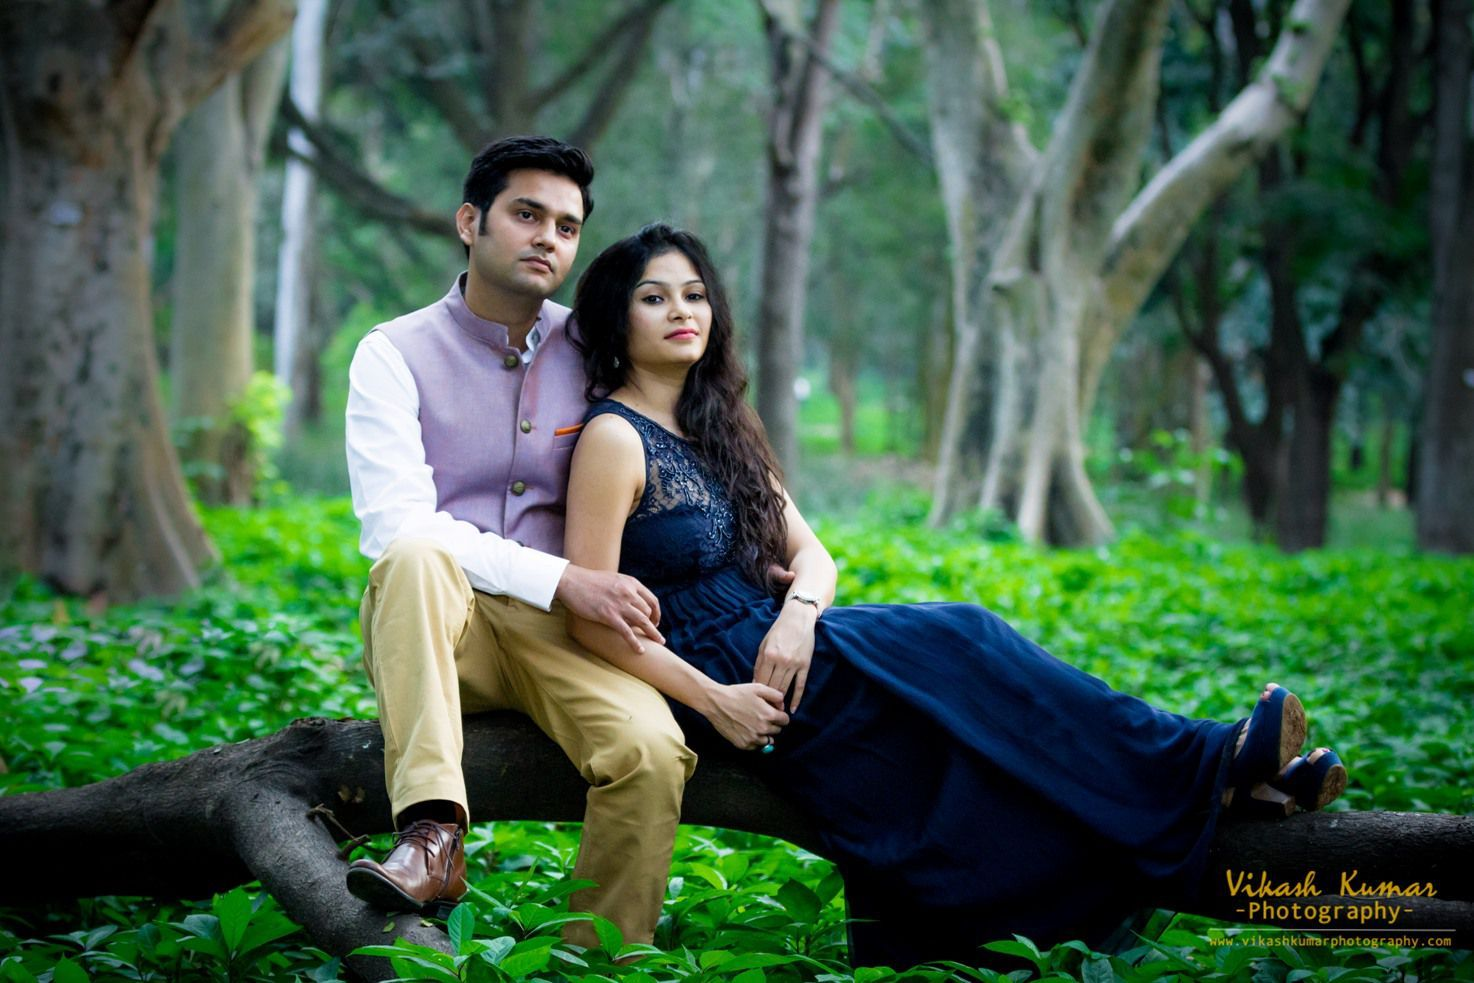 Indian Pre Wedding Photoshoot Ideas 2016 Latest Fashion